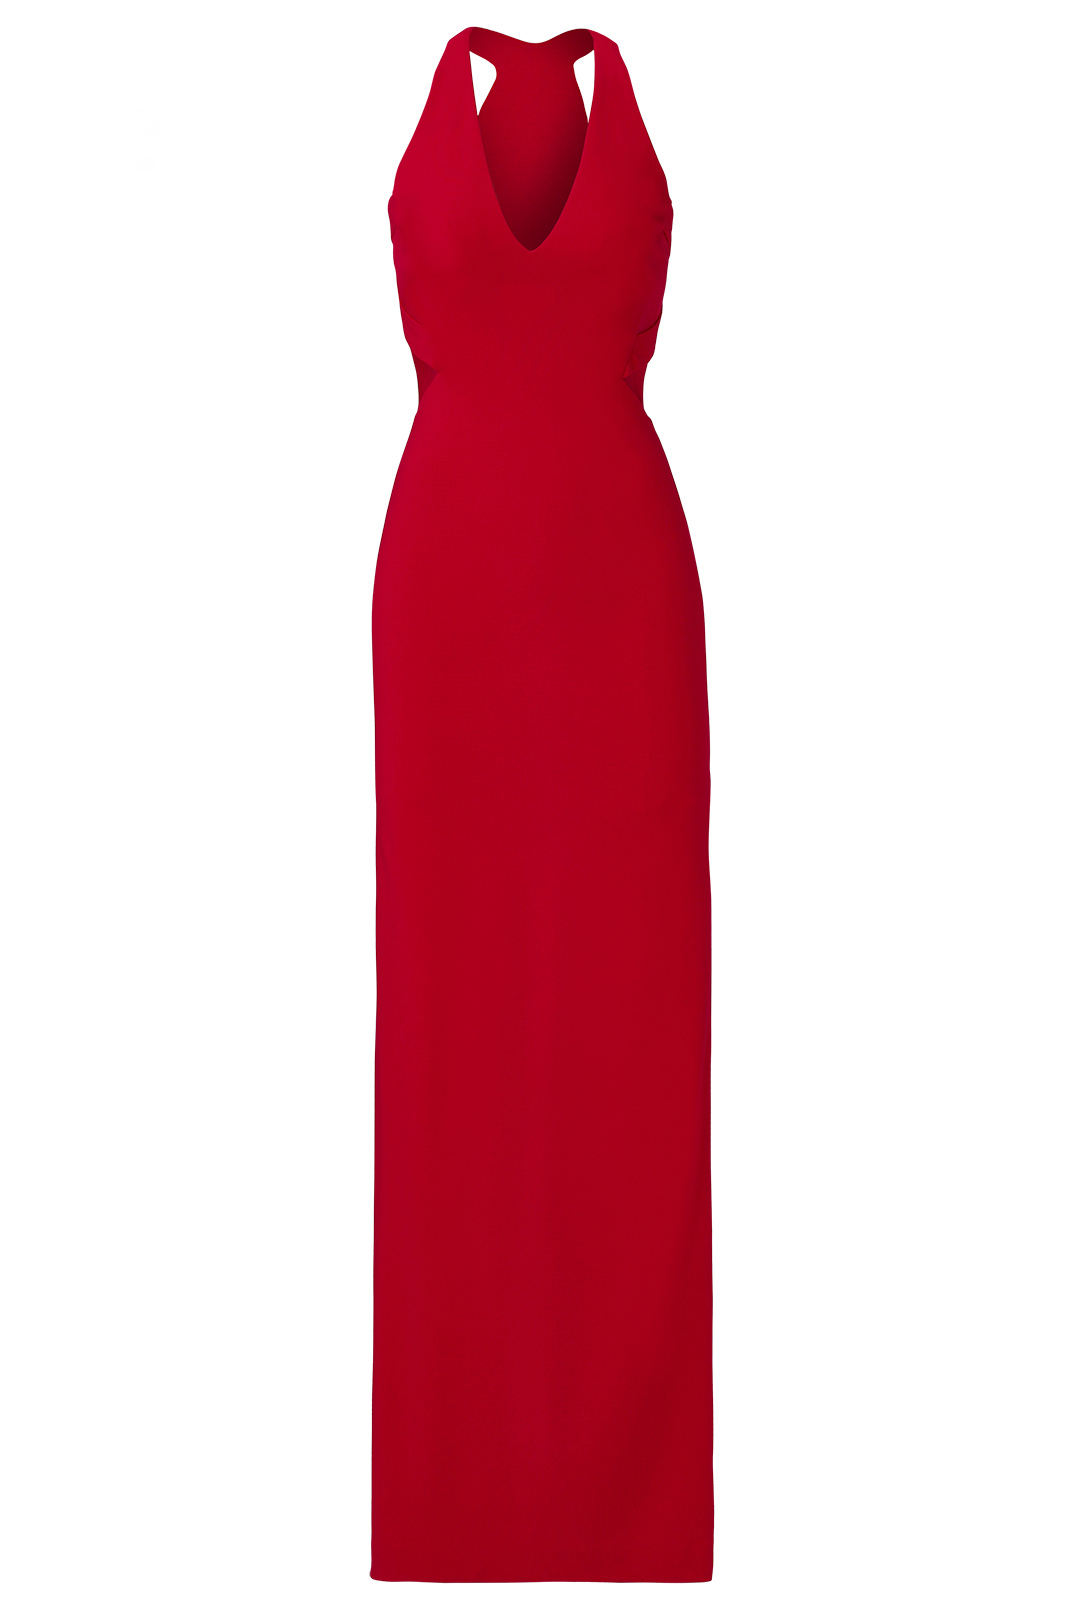 Nicole Miller Red Gown.jpg